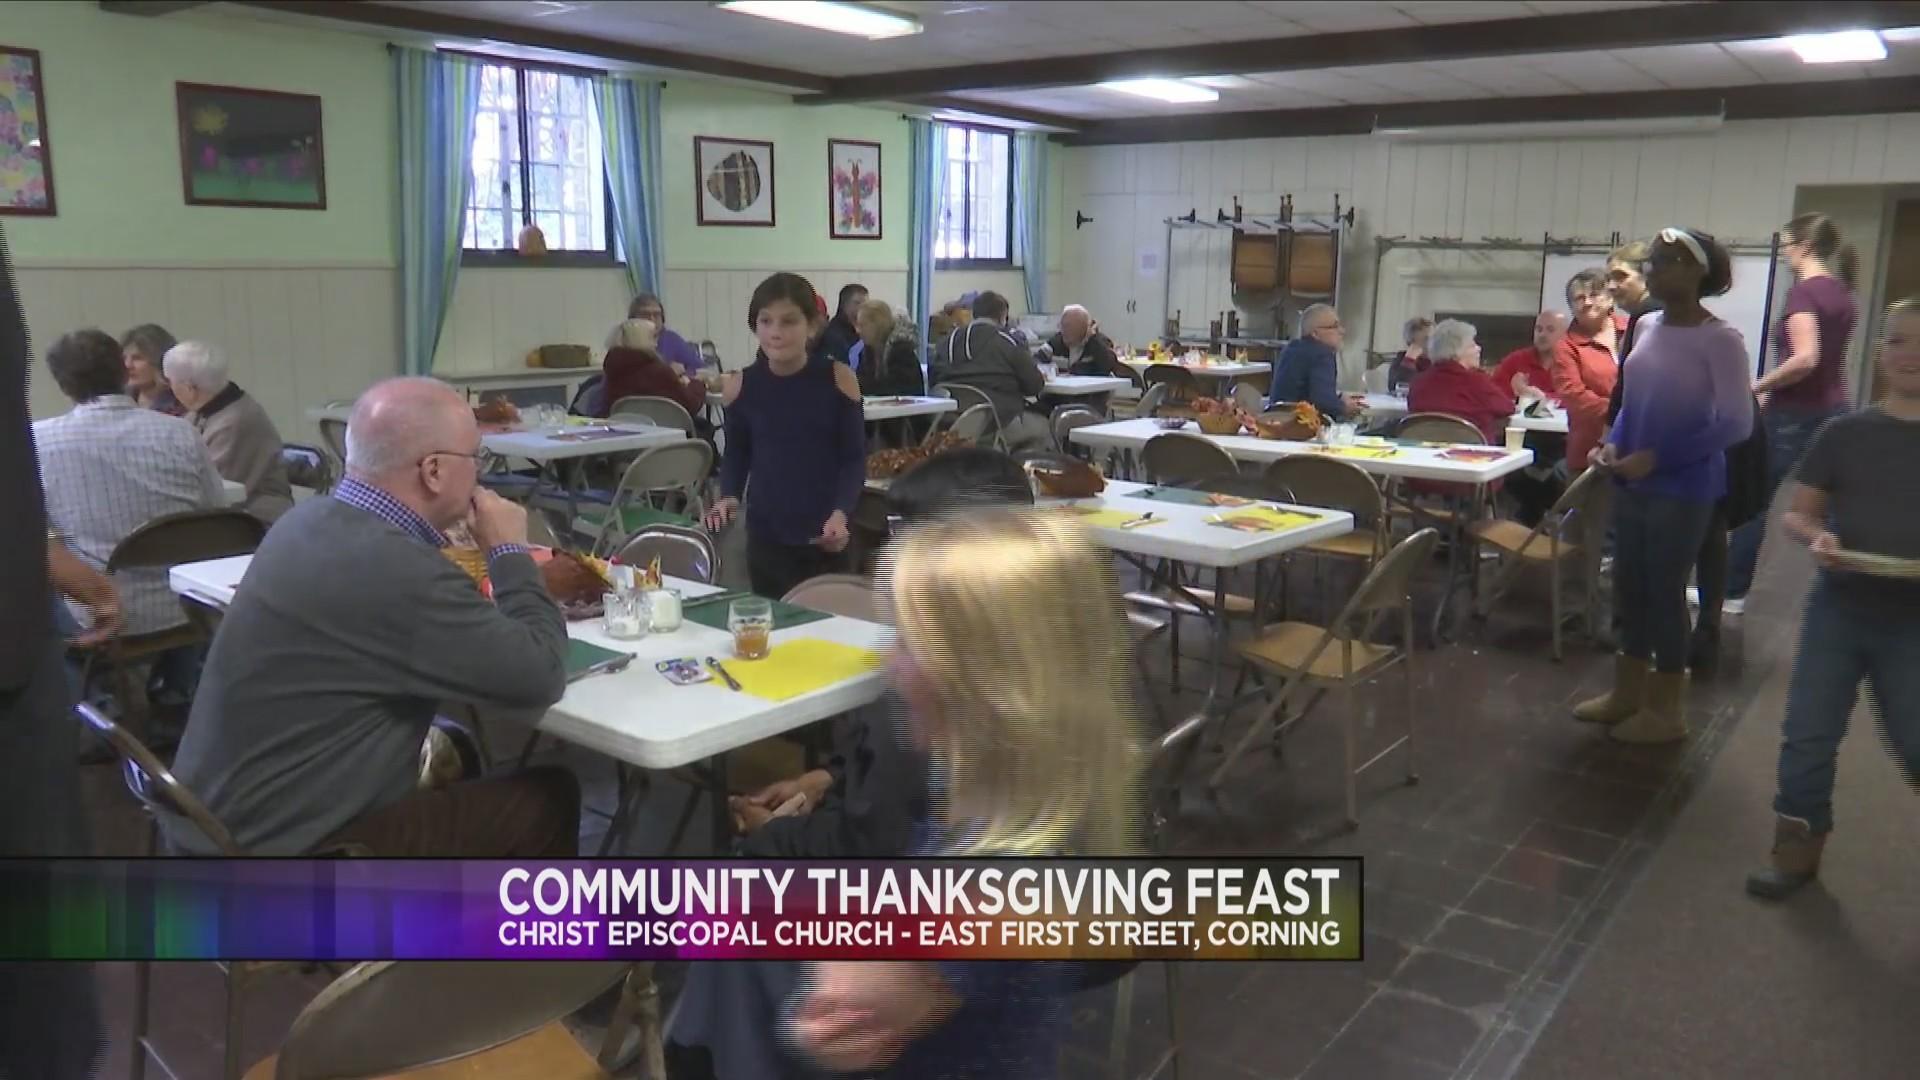 Christ_Episcopal_Church_hosts_community__0_20181122232352